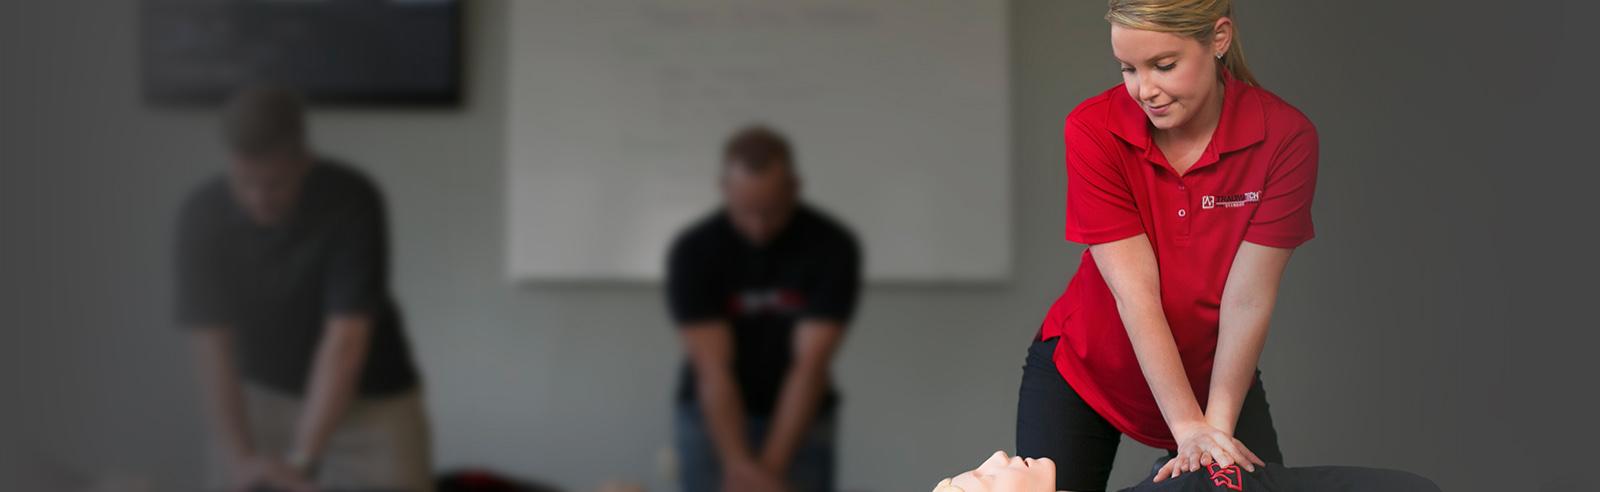 First Aid Courses Trauma Tech Cpr First Aid Training